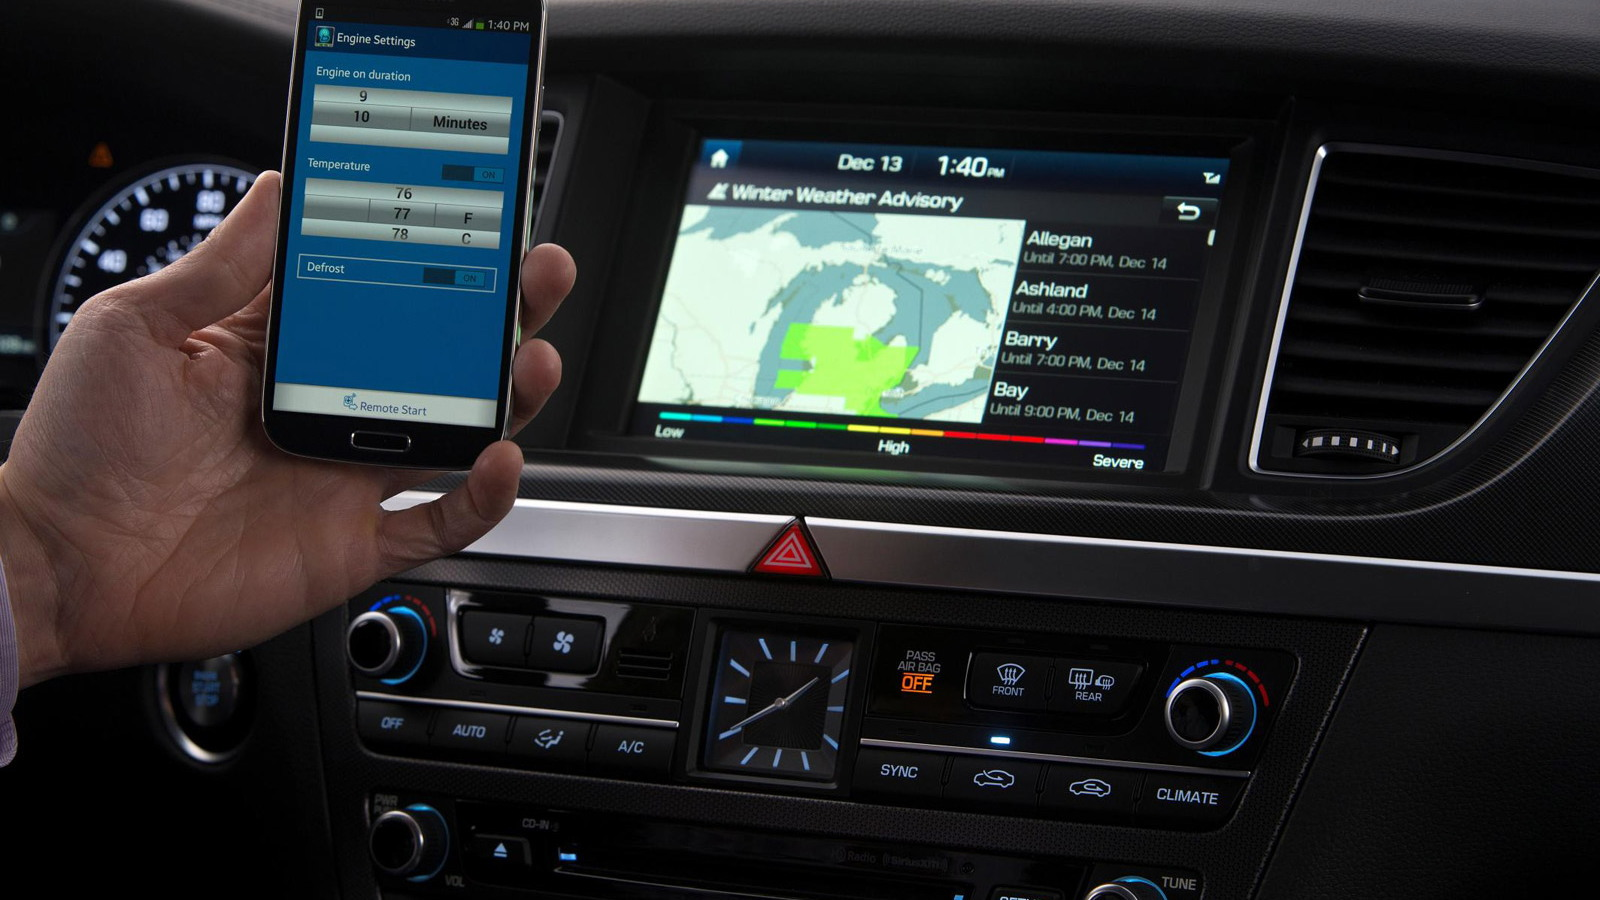 Hyundai next-generation Blue Link interface